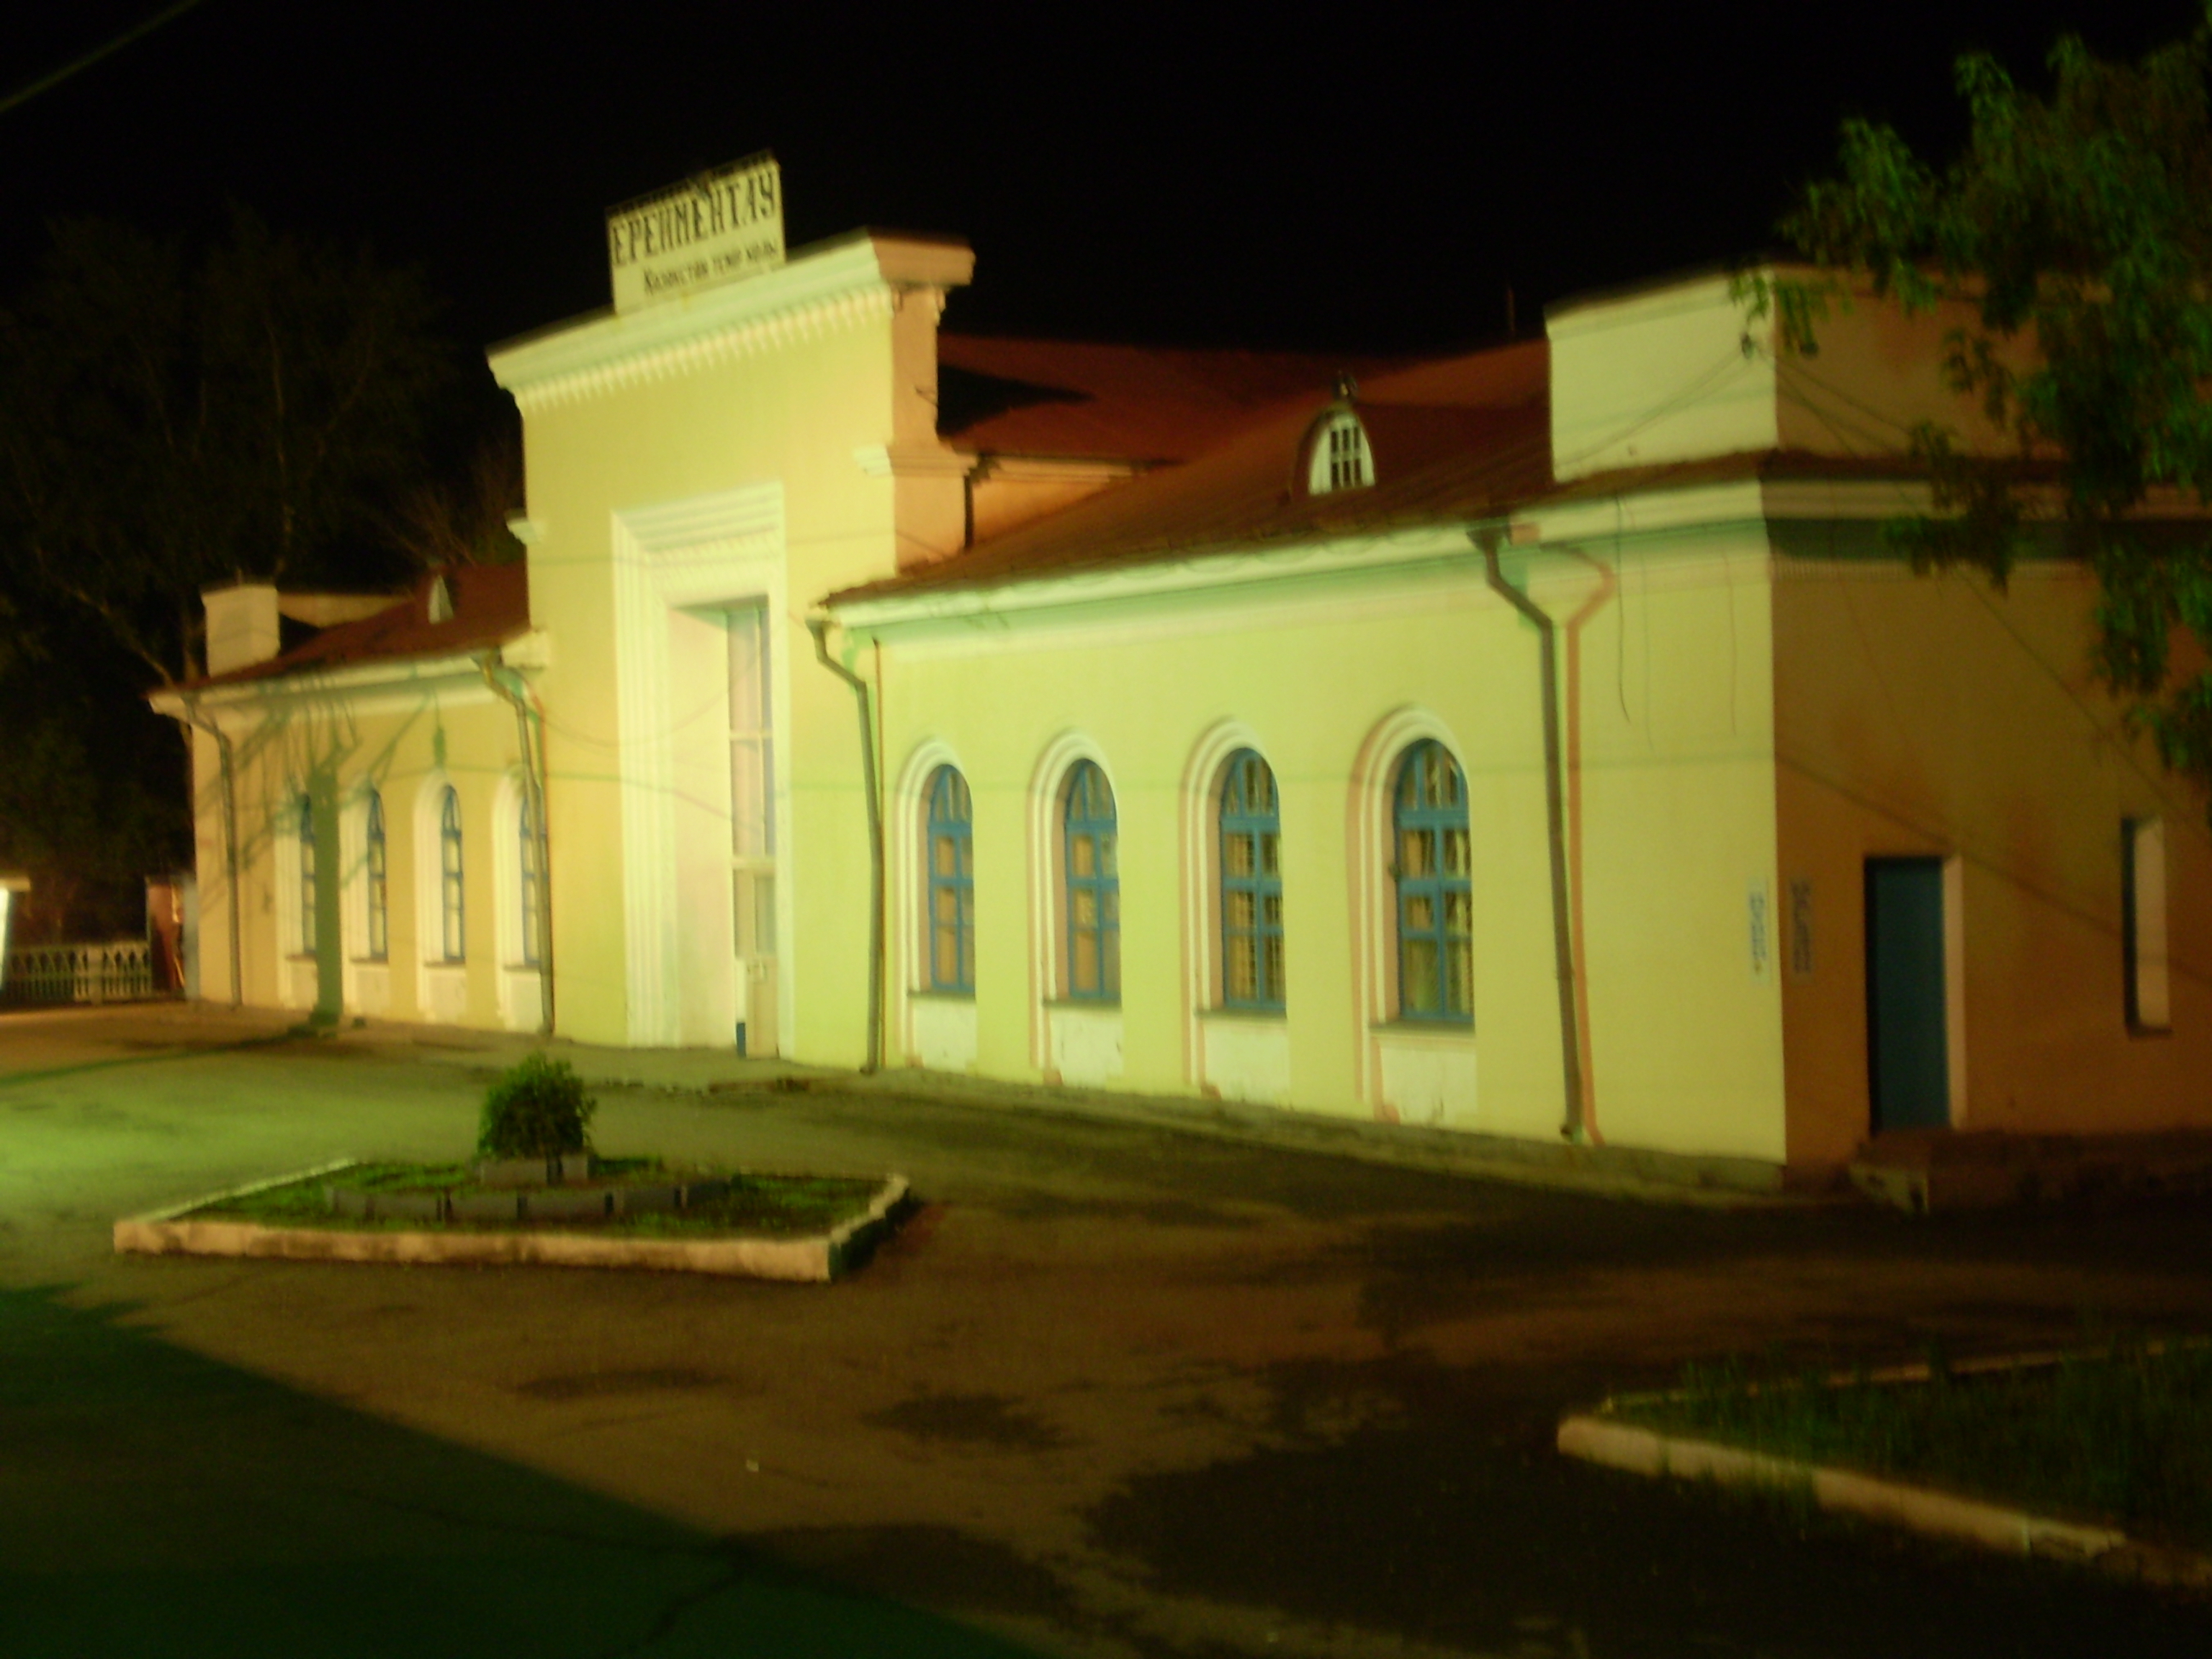 Akmola Kazakhstan  City pictures : ... railway station. Akmola oblast, Kazakhstan. 2009. Night view